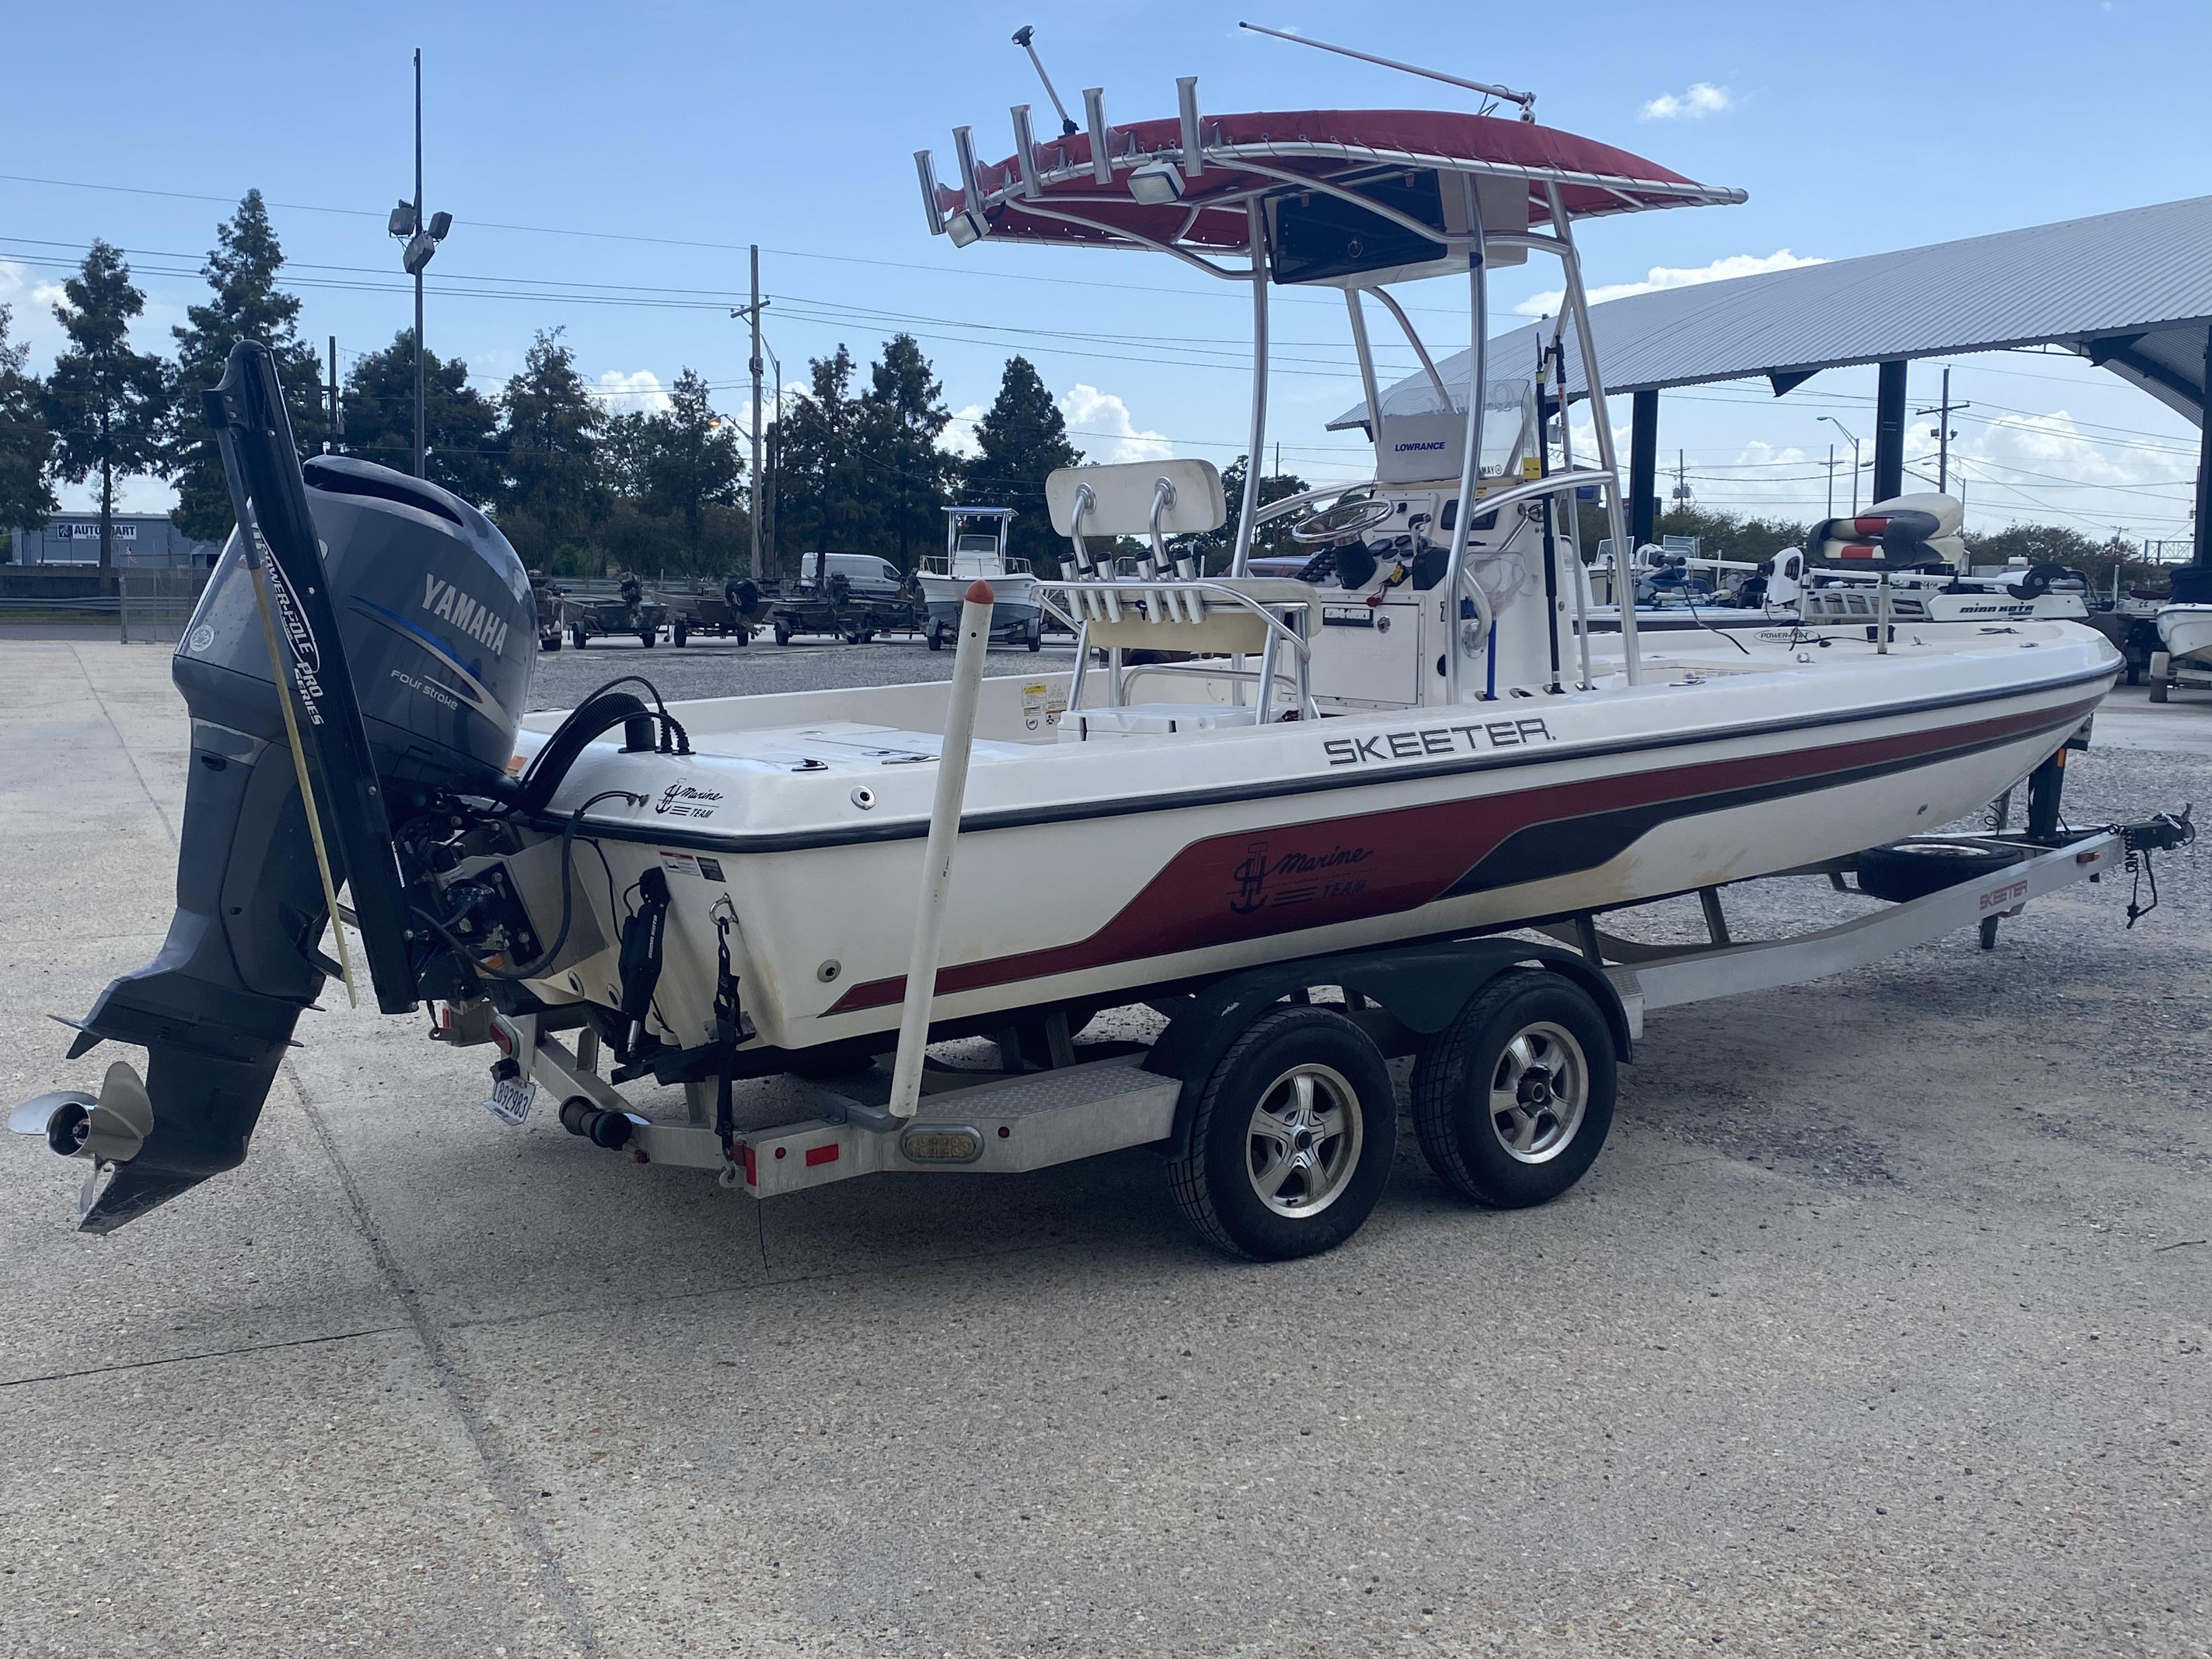 2010 Skeeter boat for sale, model of the boat is ZX24V & Image # 3 of 16